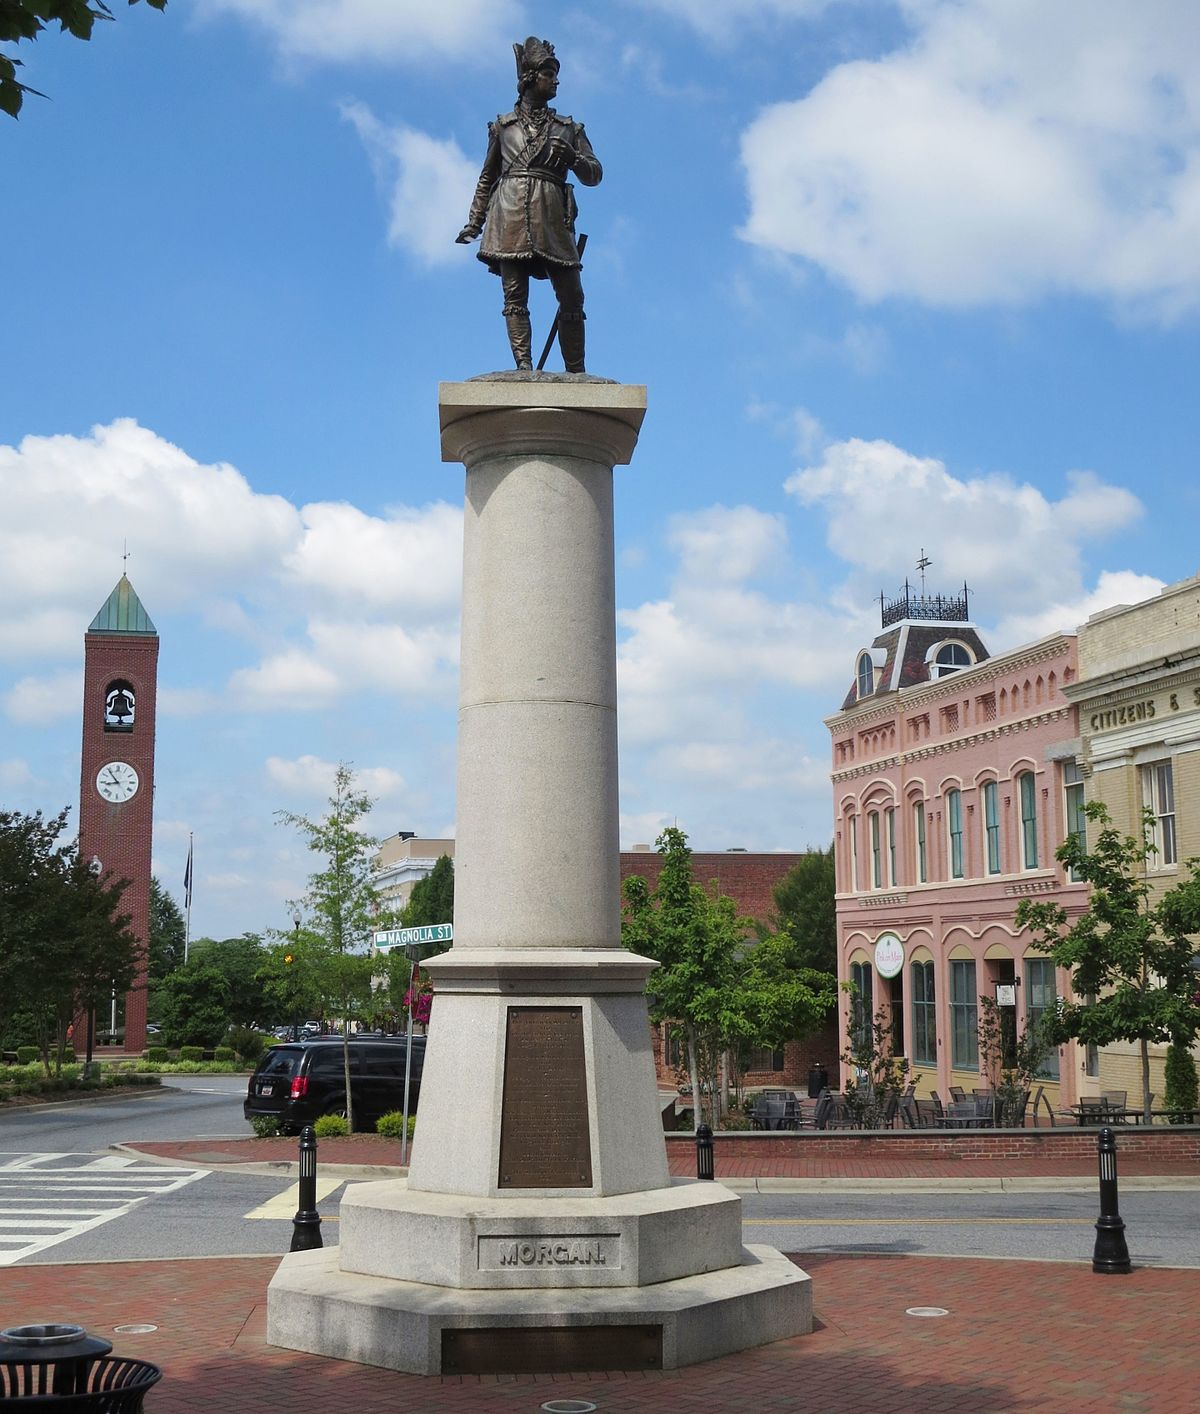 Daniel Morgan Monument Wikipedia